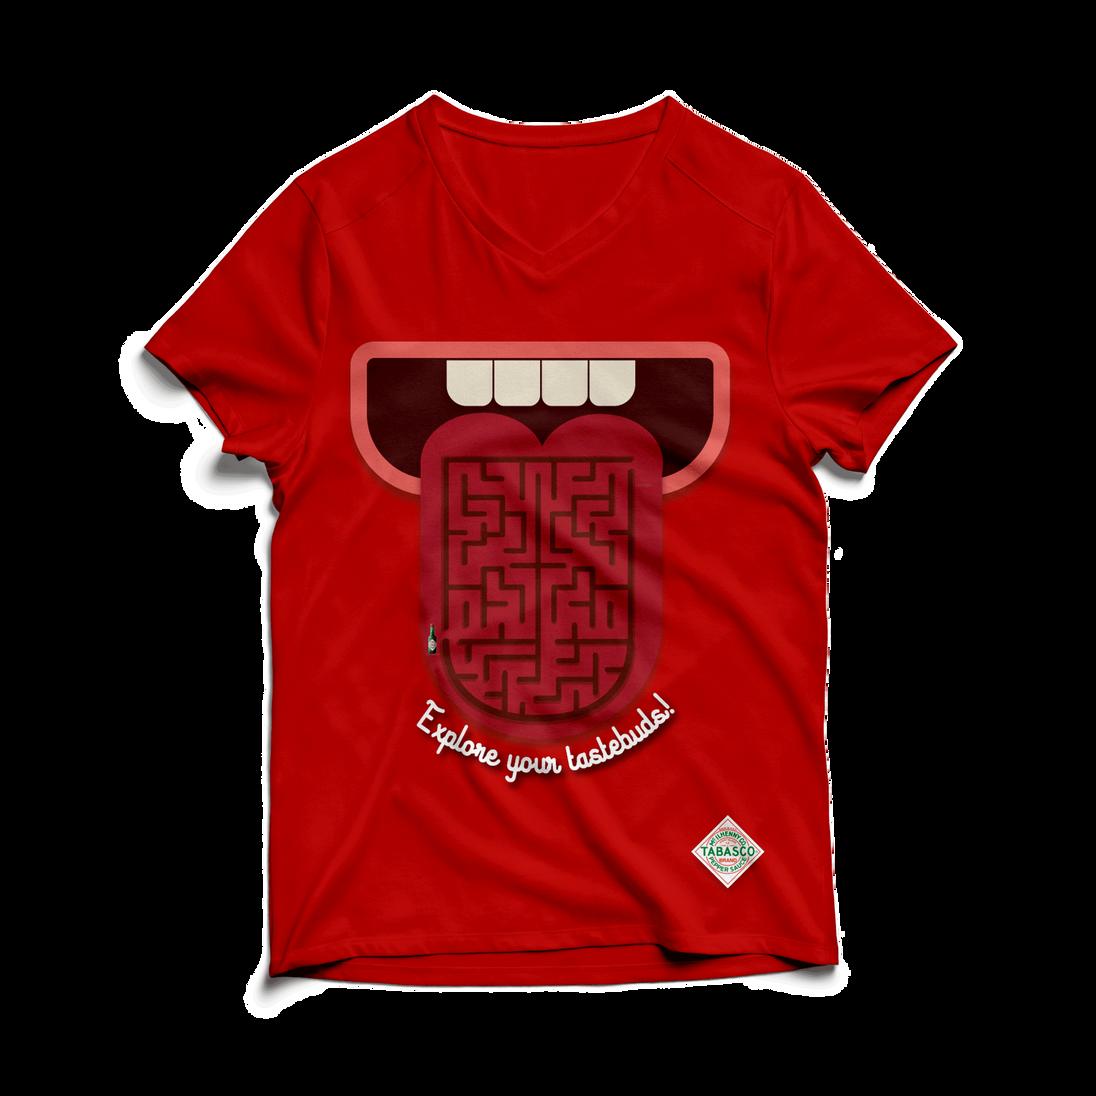 Tabasco-shirt-2.png